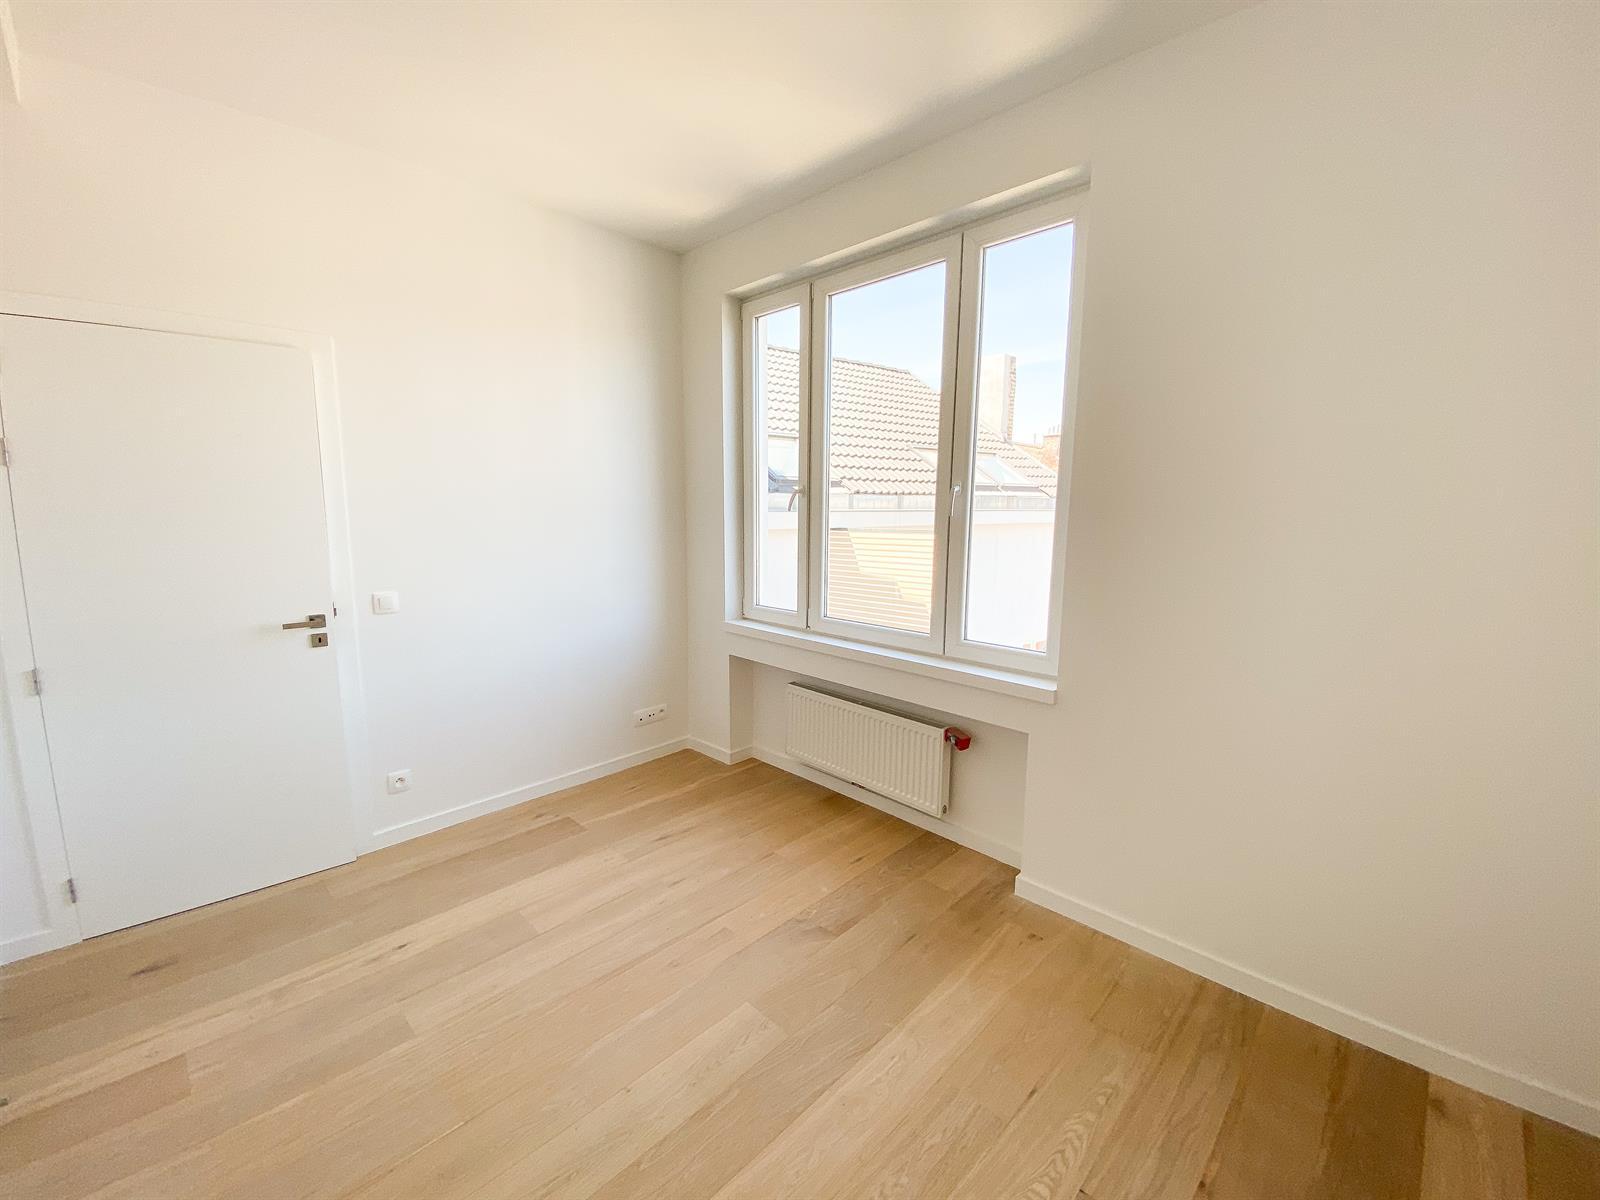 Appartement - Liège - #4045839-11